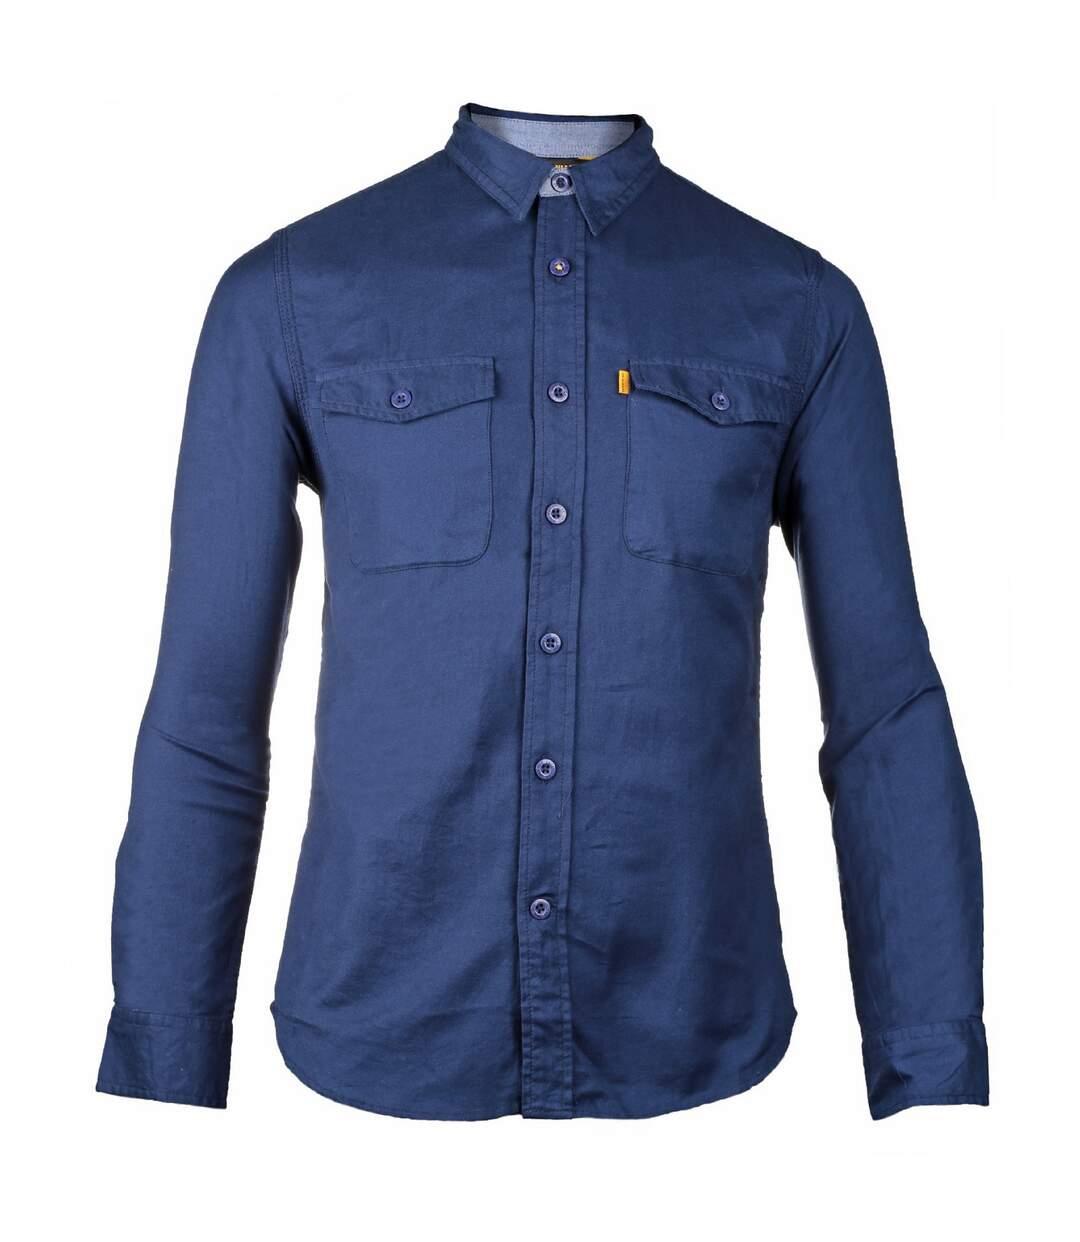 CAT Lifestyle Mens Tango Long Sleeve Shirt (Blue) - UTFS4042